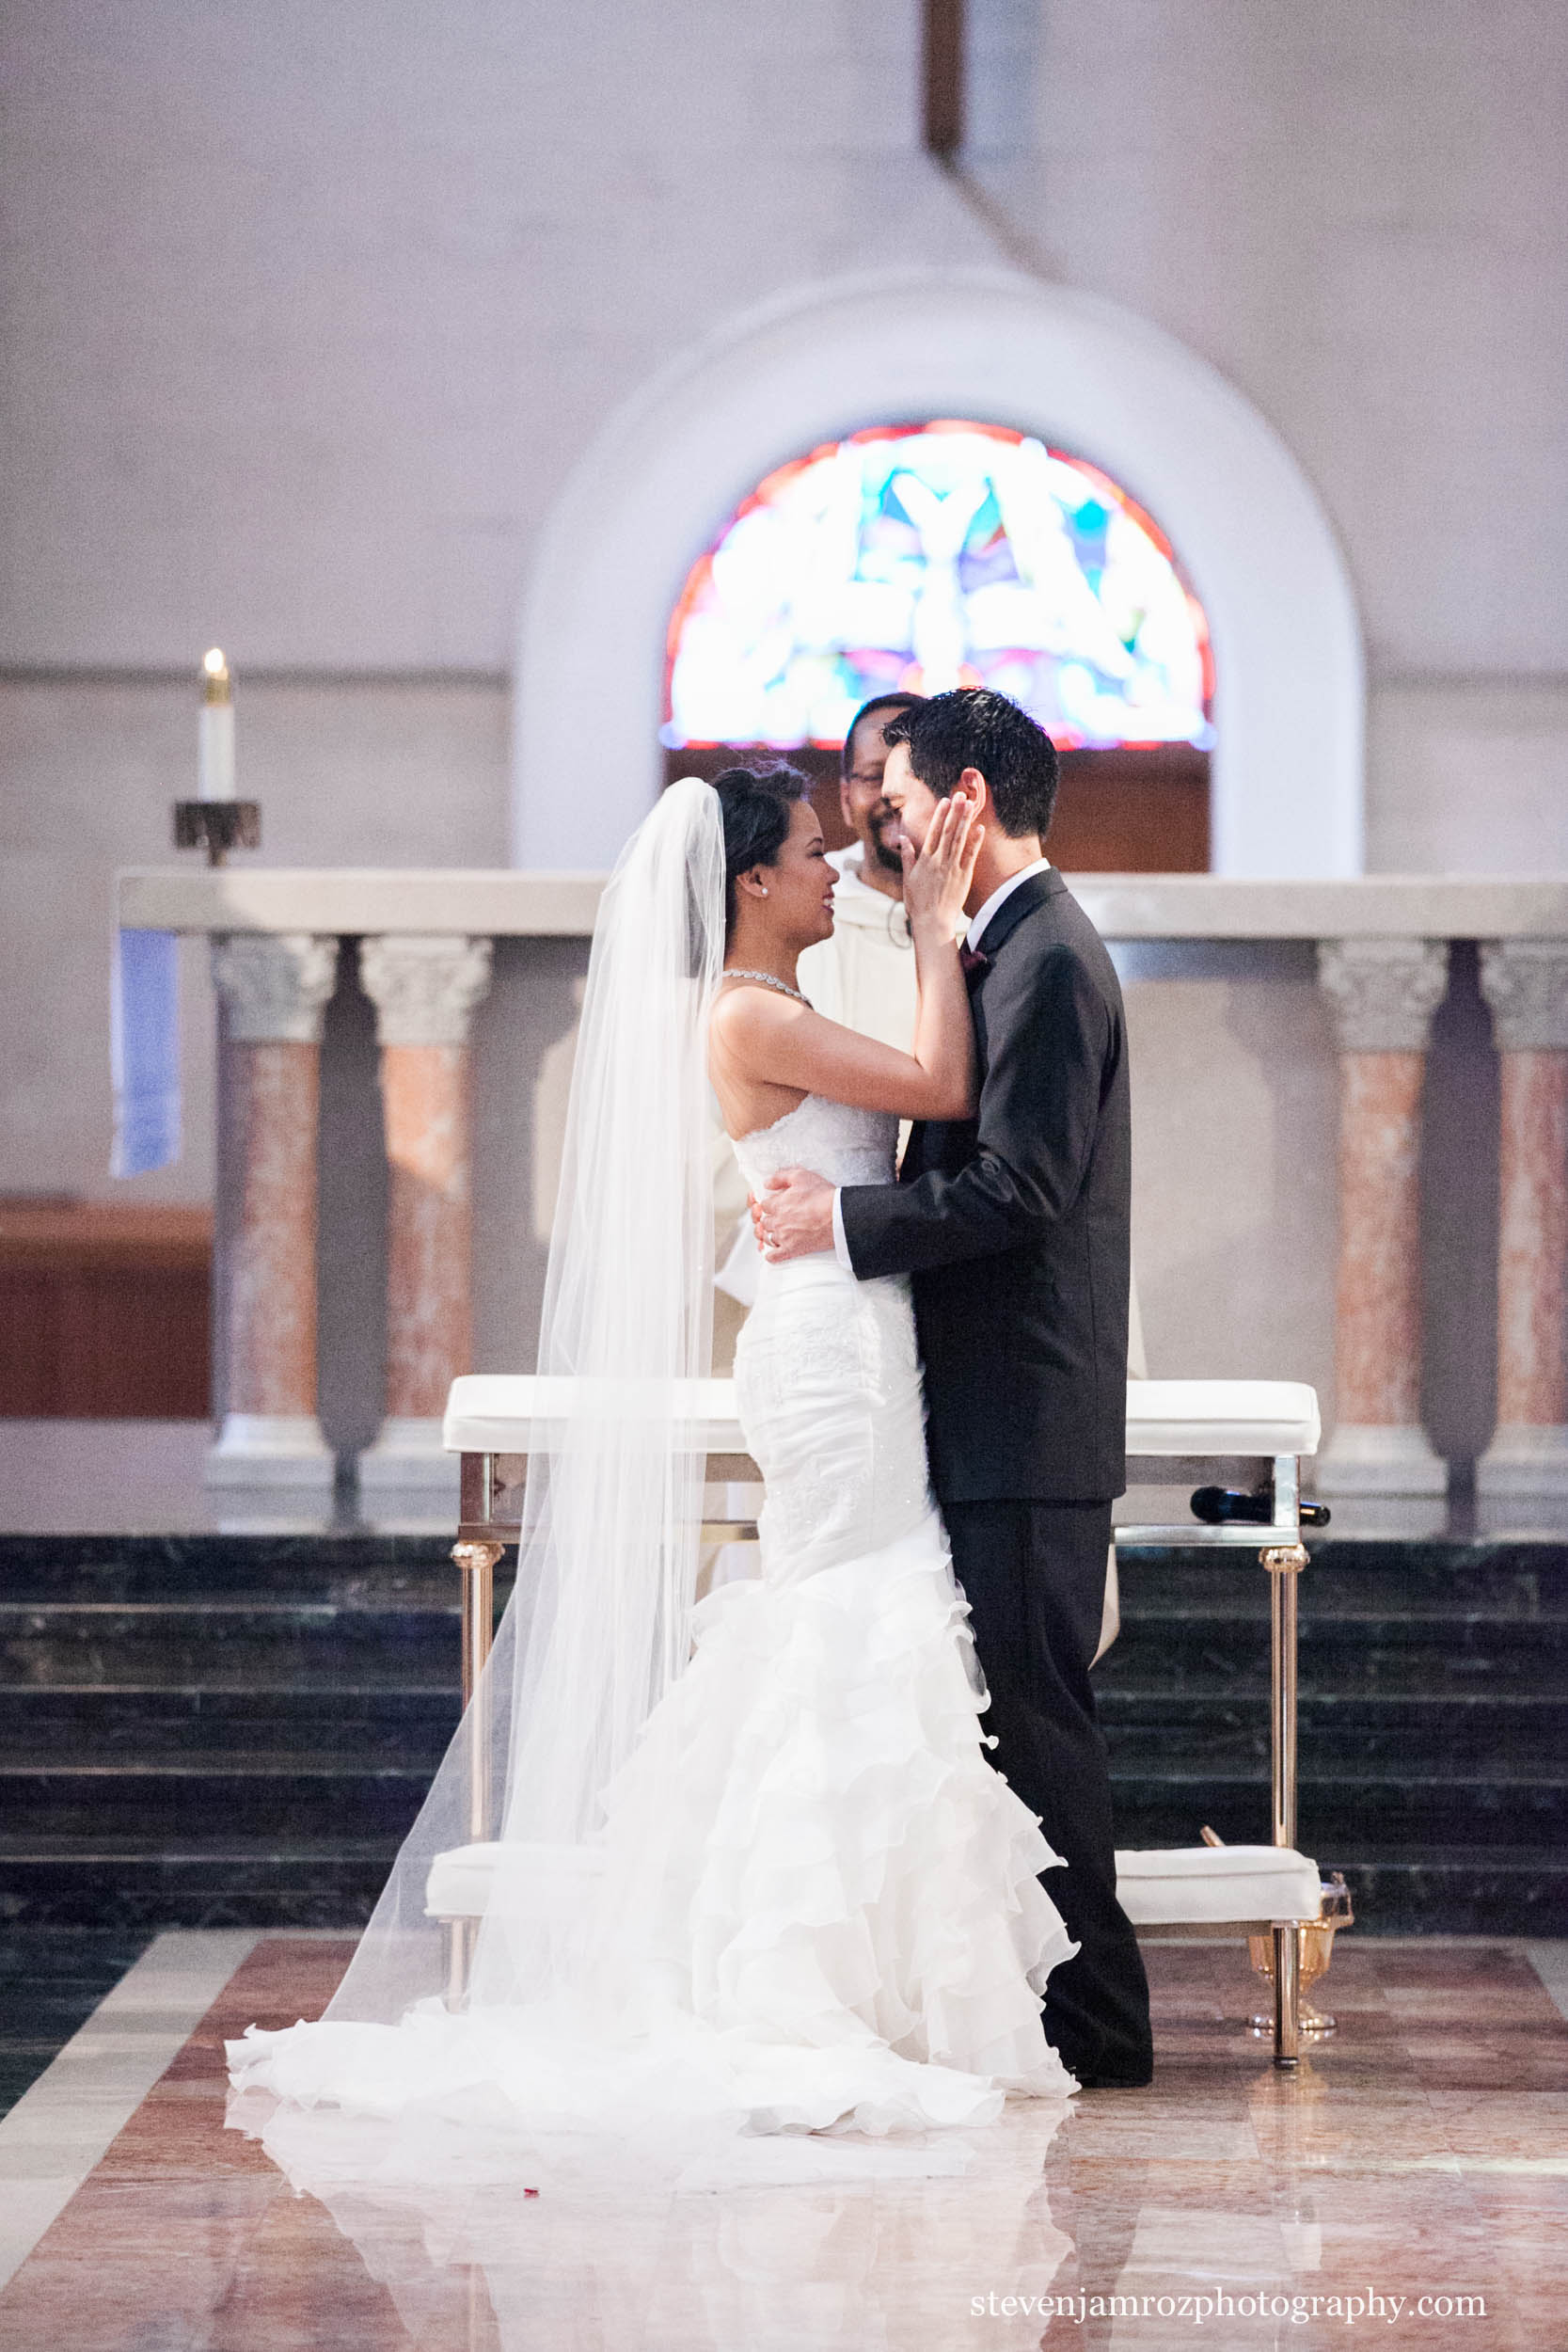 kiss-in-chapel-wedding-chapel-hill-steven-jamroz-photography-0233.jpg